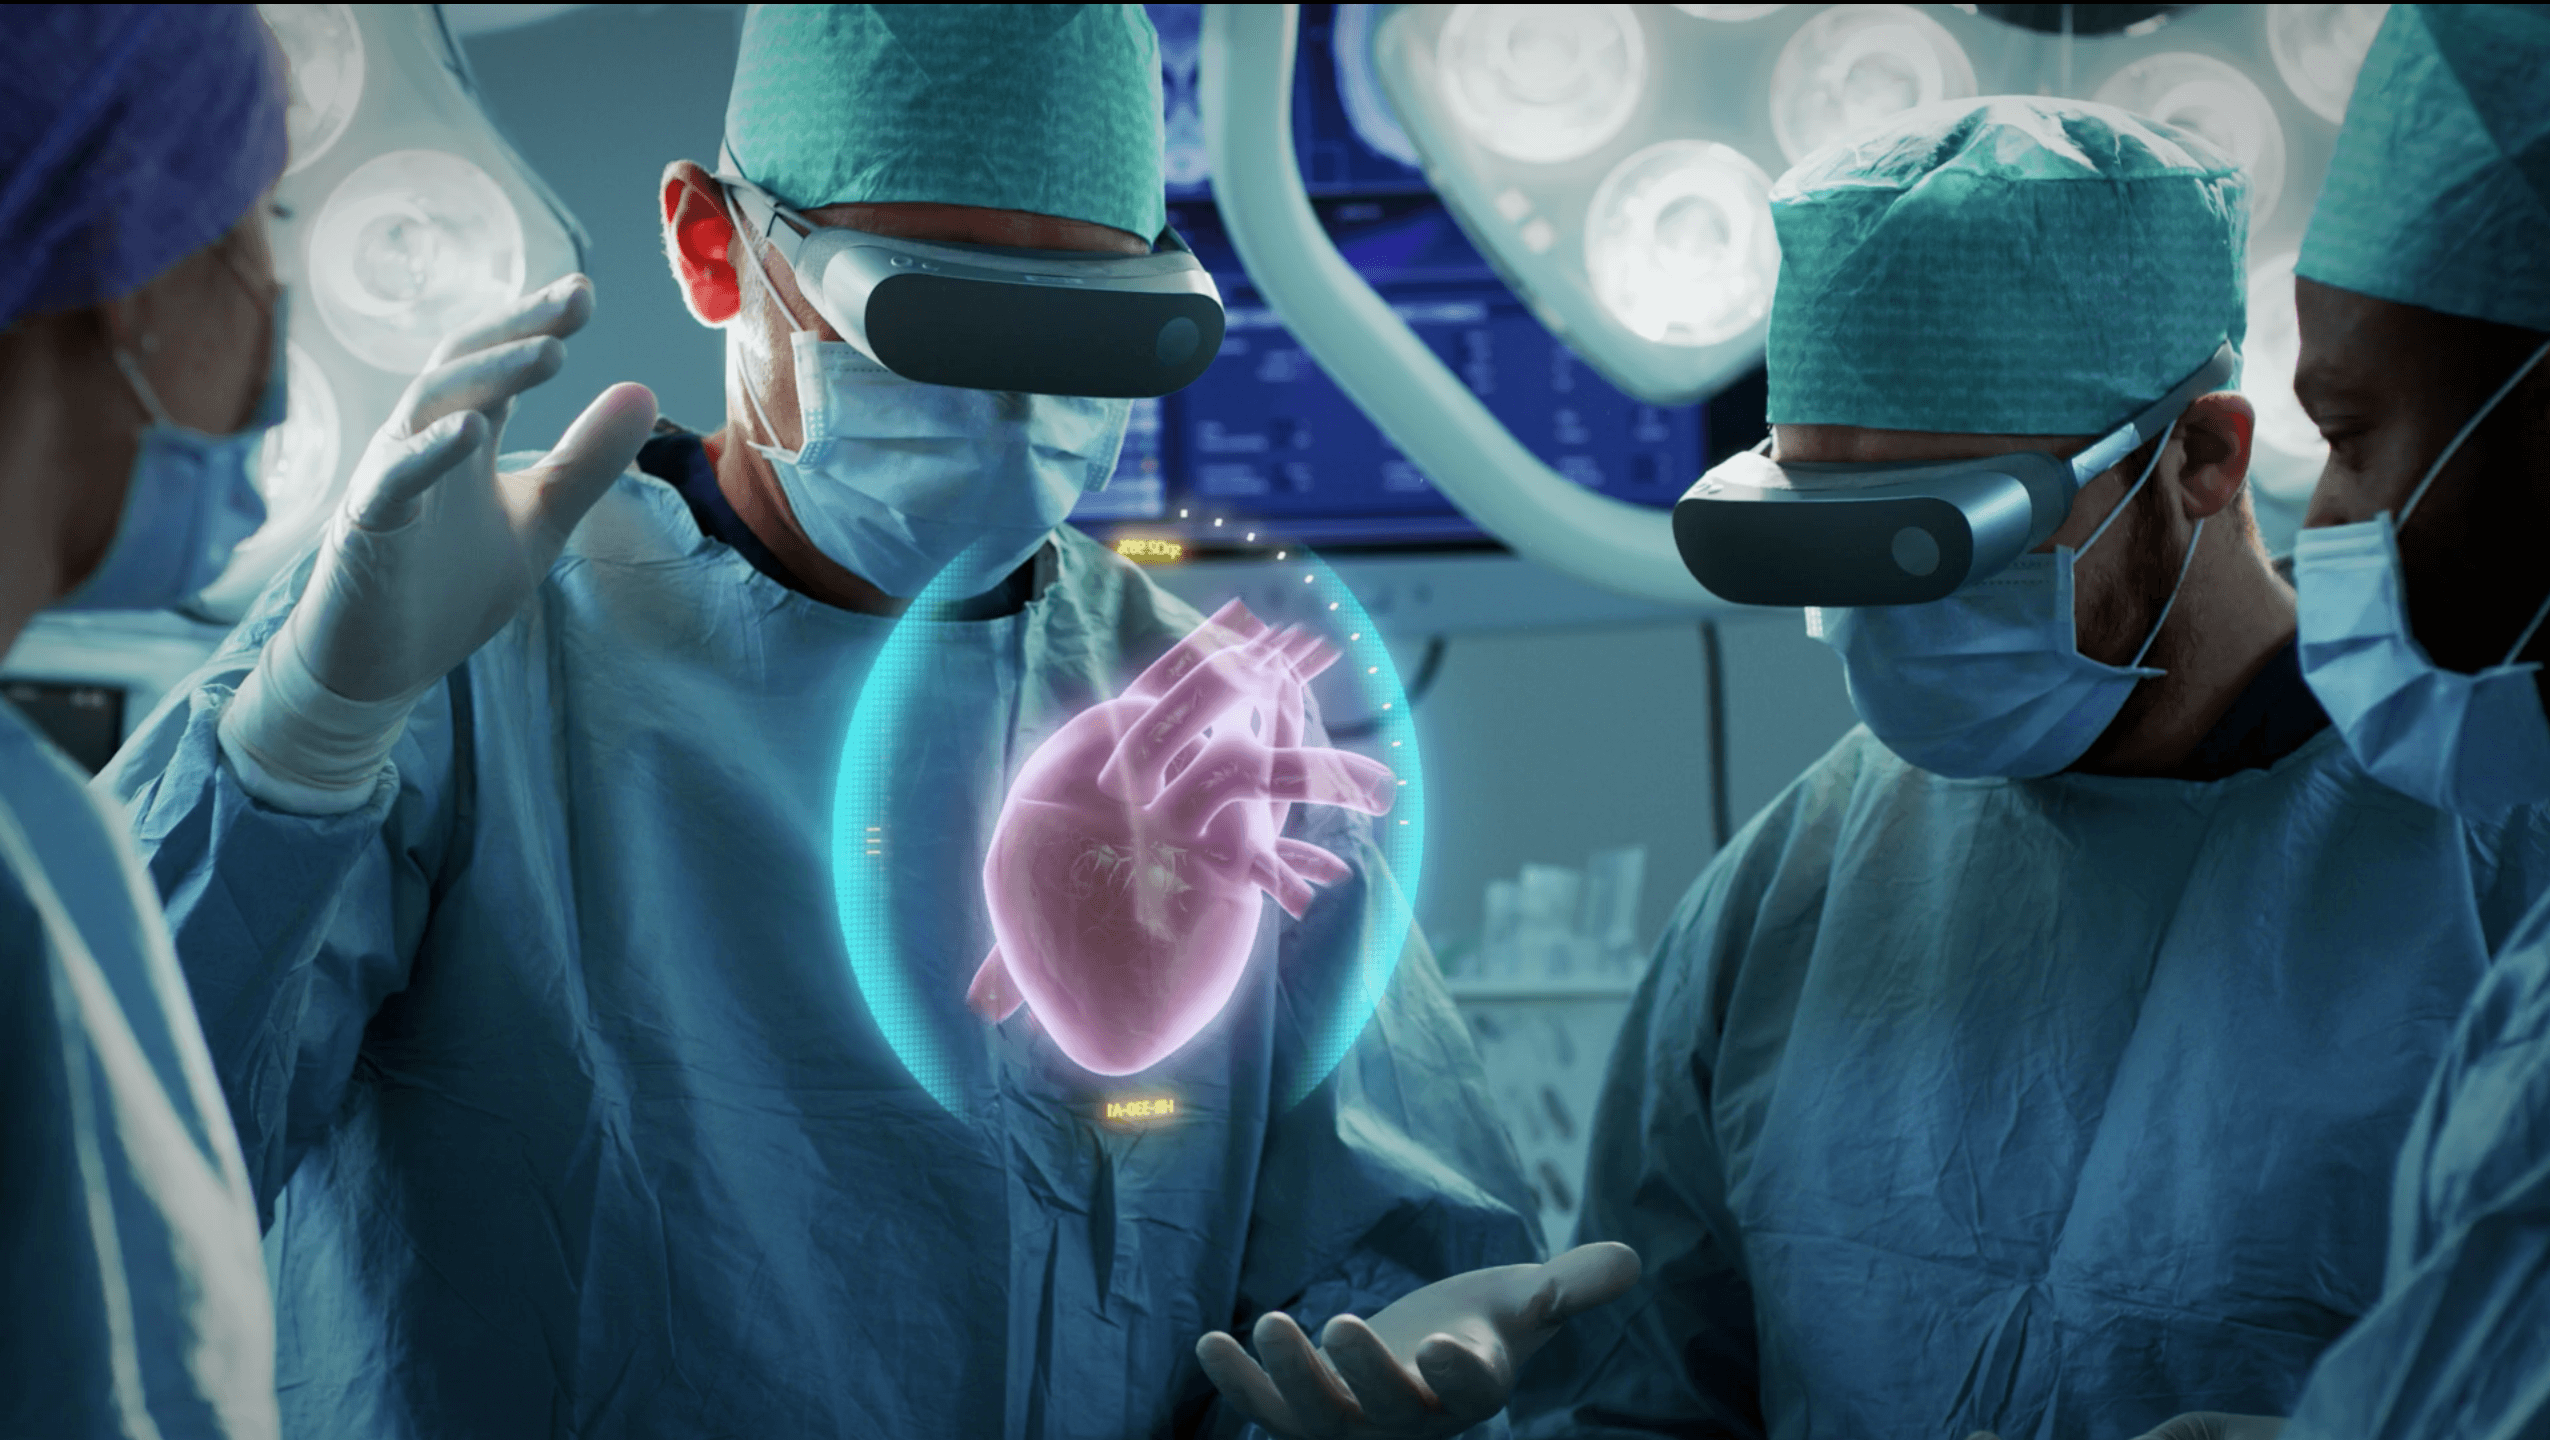 VR & AR for Healthcare & Medicine - vStream Digital Media